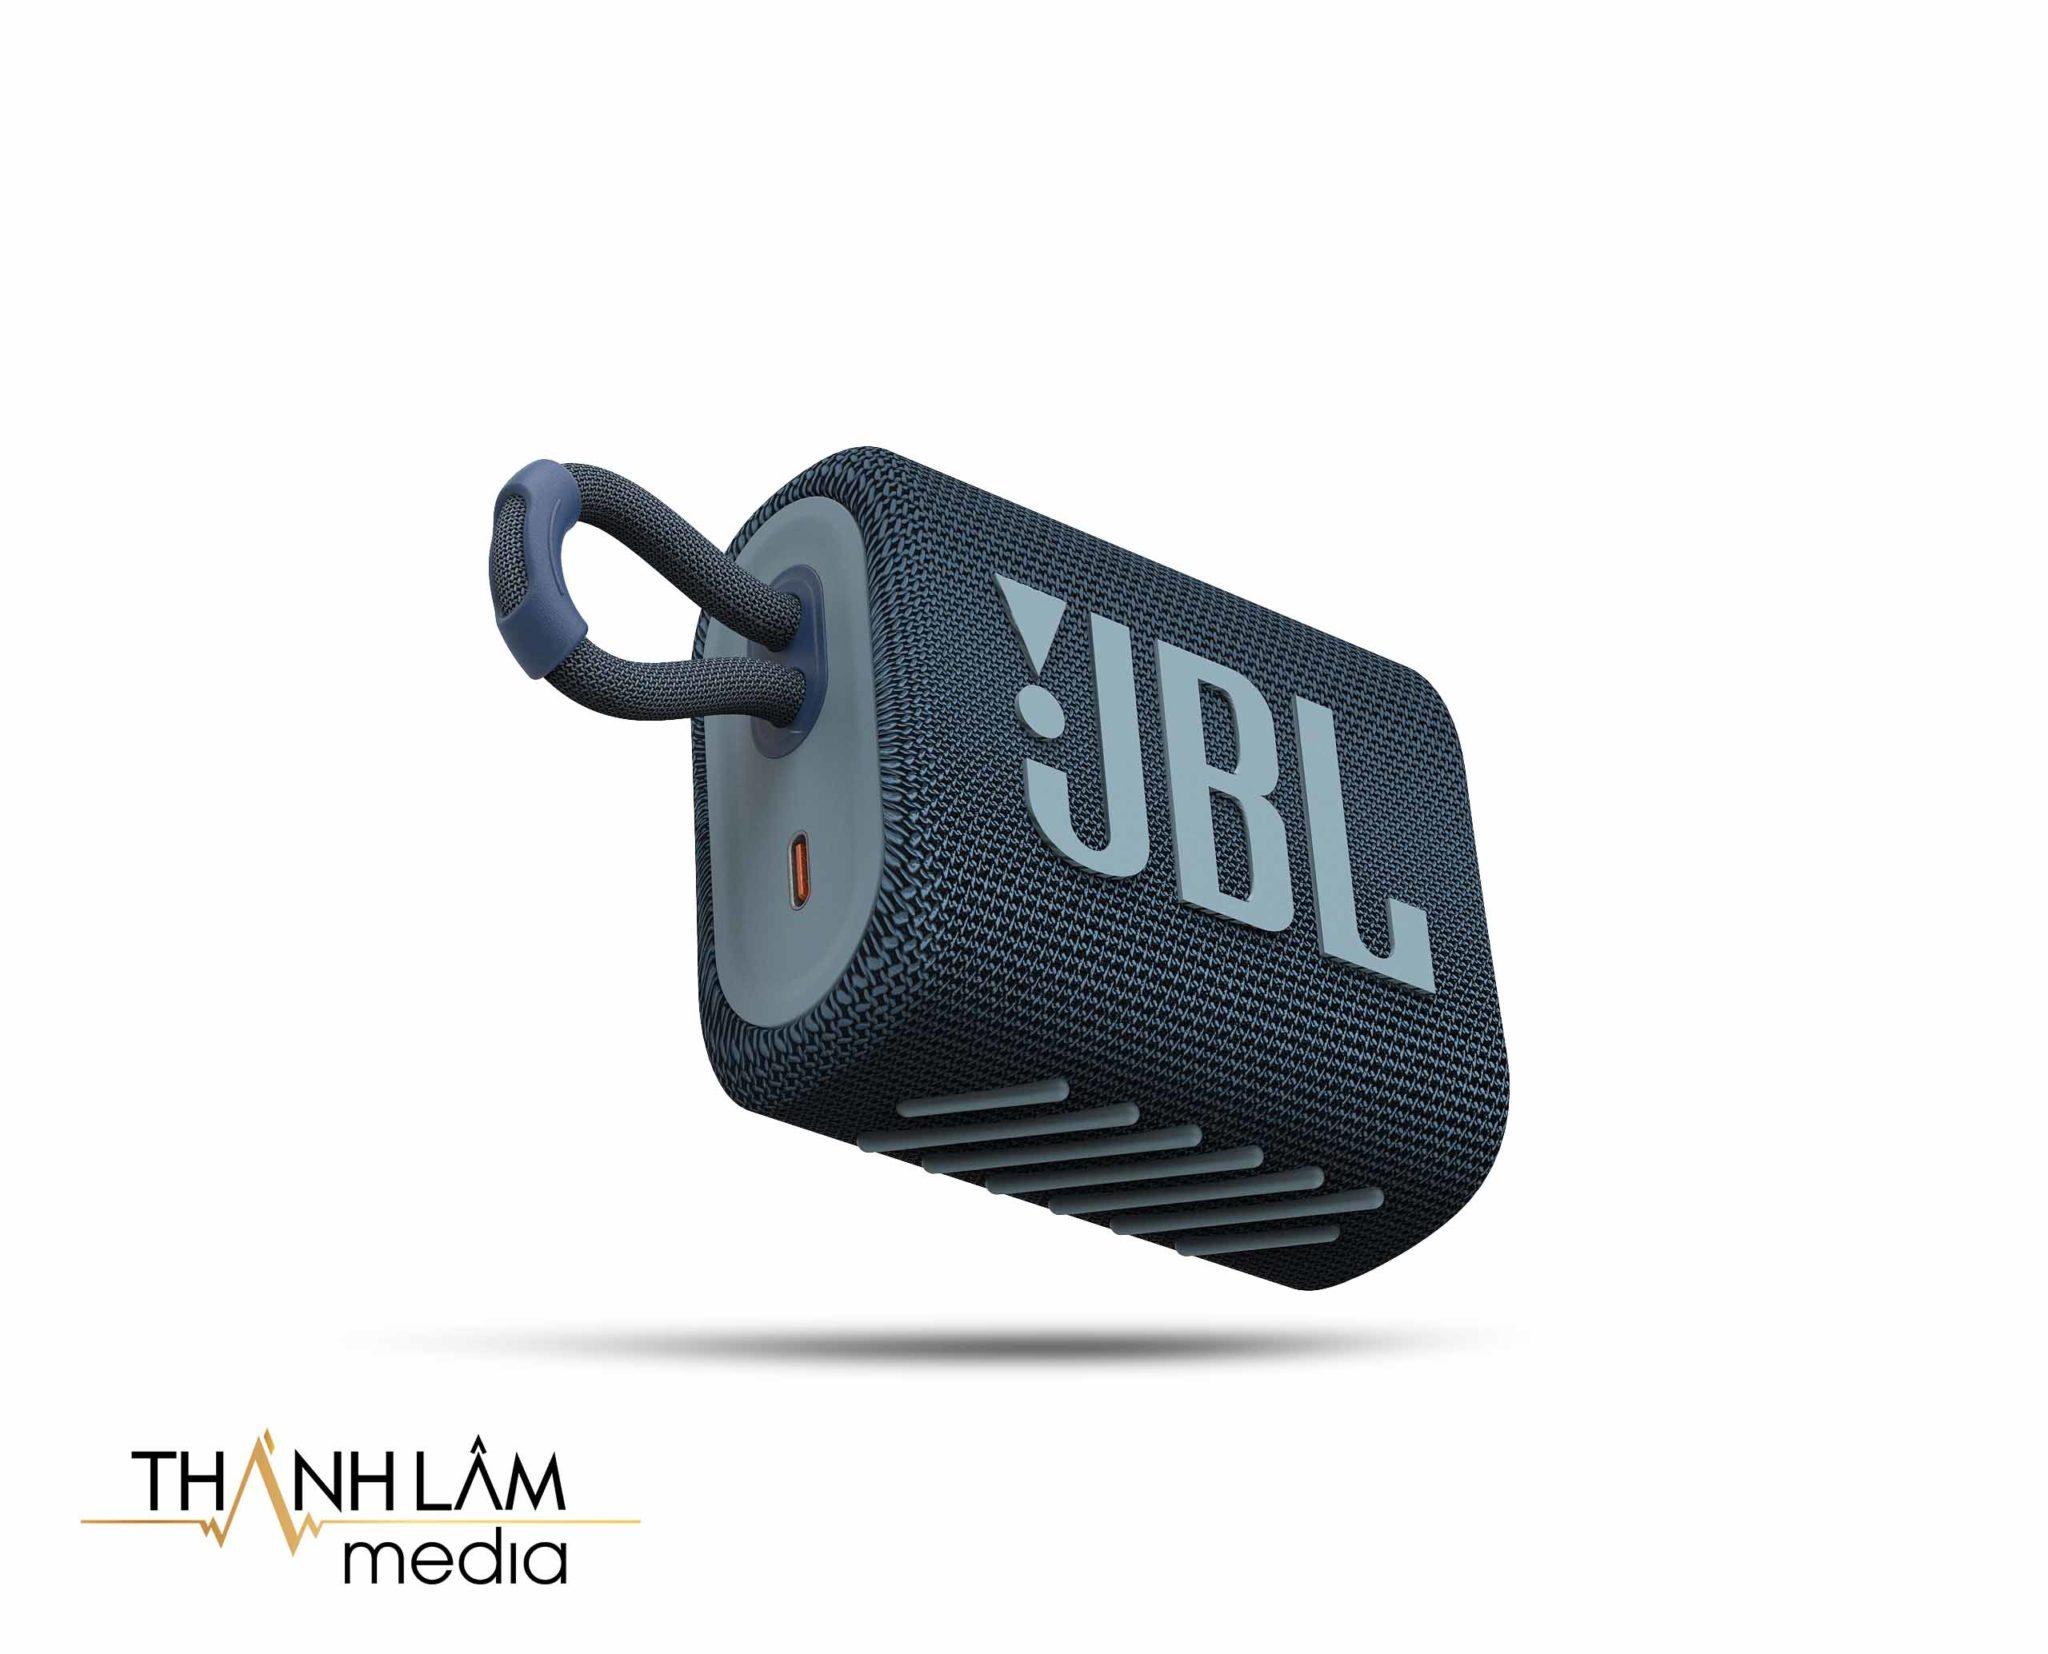 Loa JBL Go 3 mới